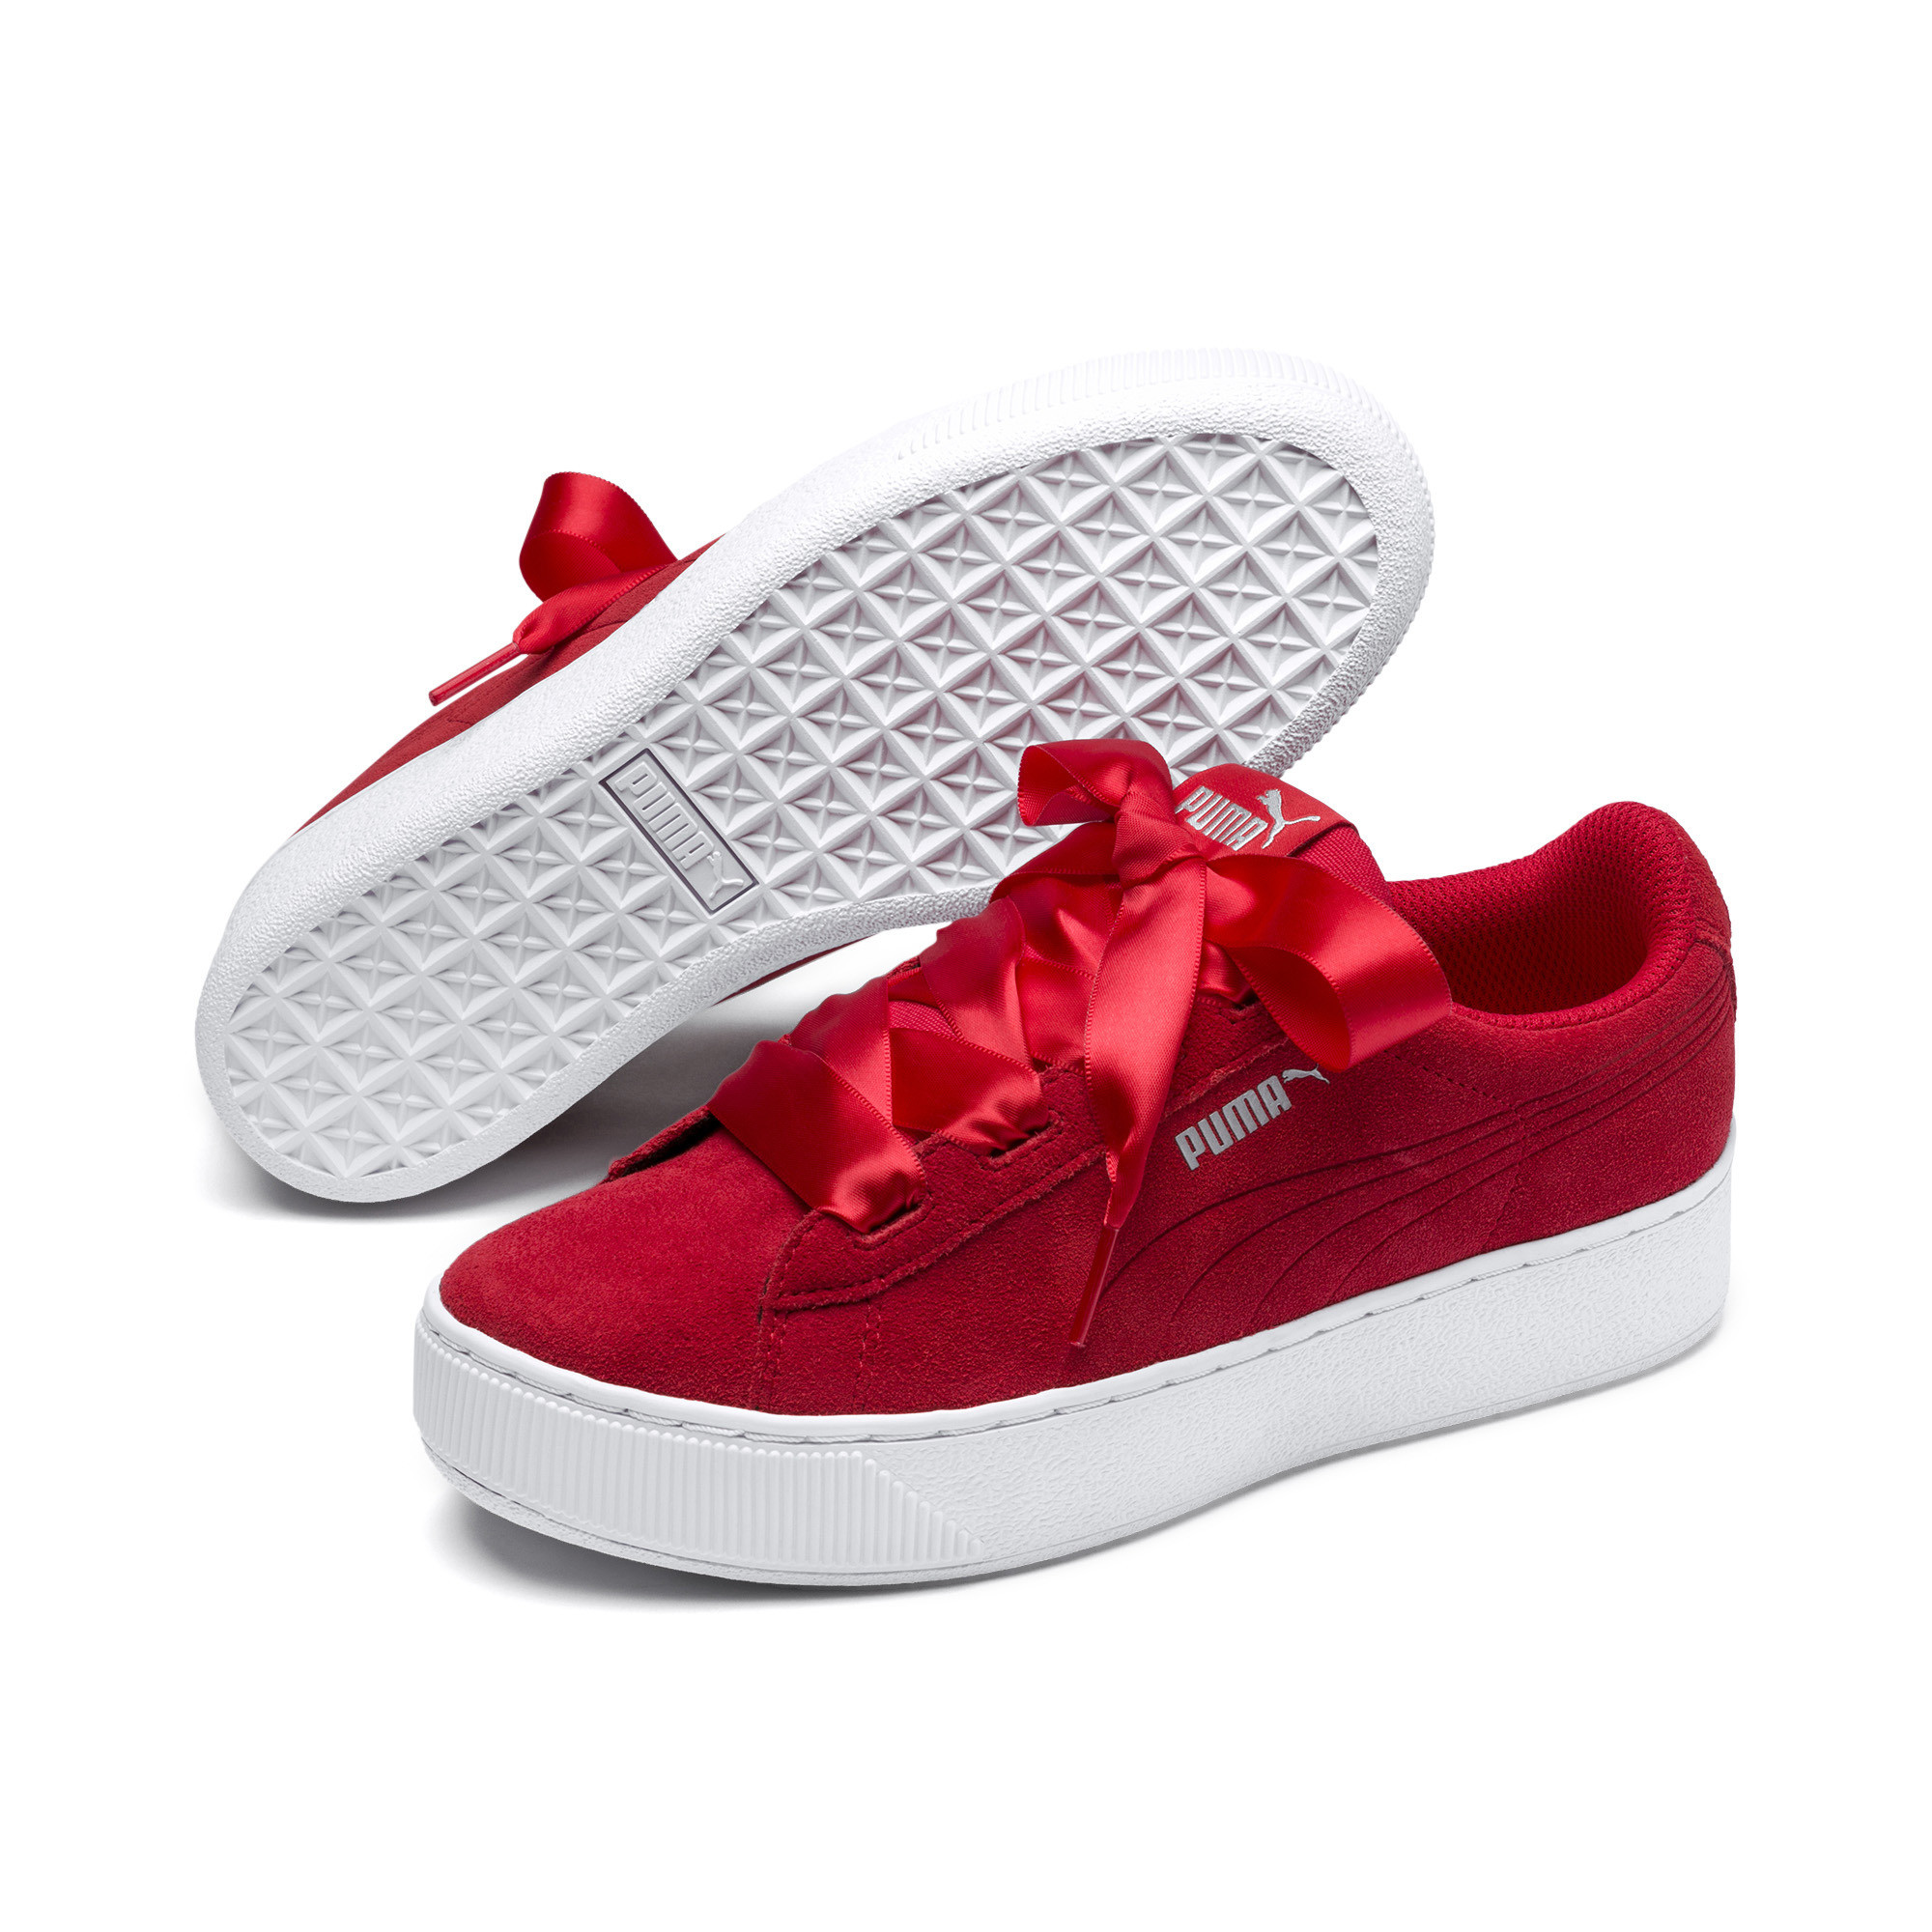 Details zu PUMA Vikky Platform Ribbon Kids Mädchen Sneaker Mädchen Schuhe  Kinder Neu